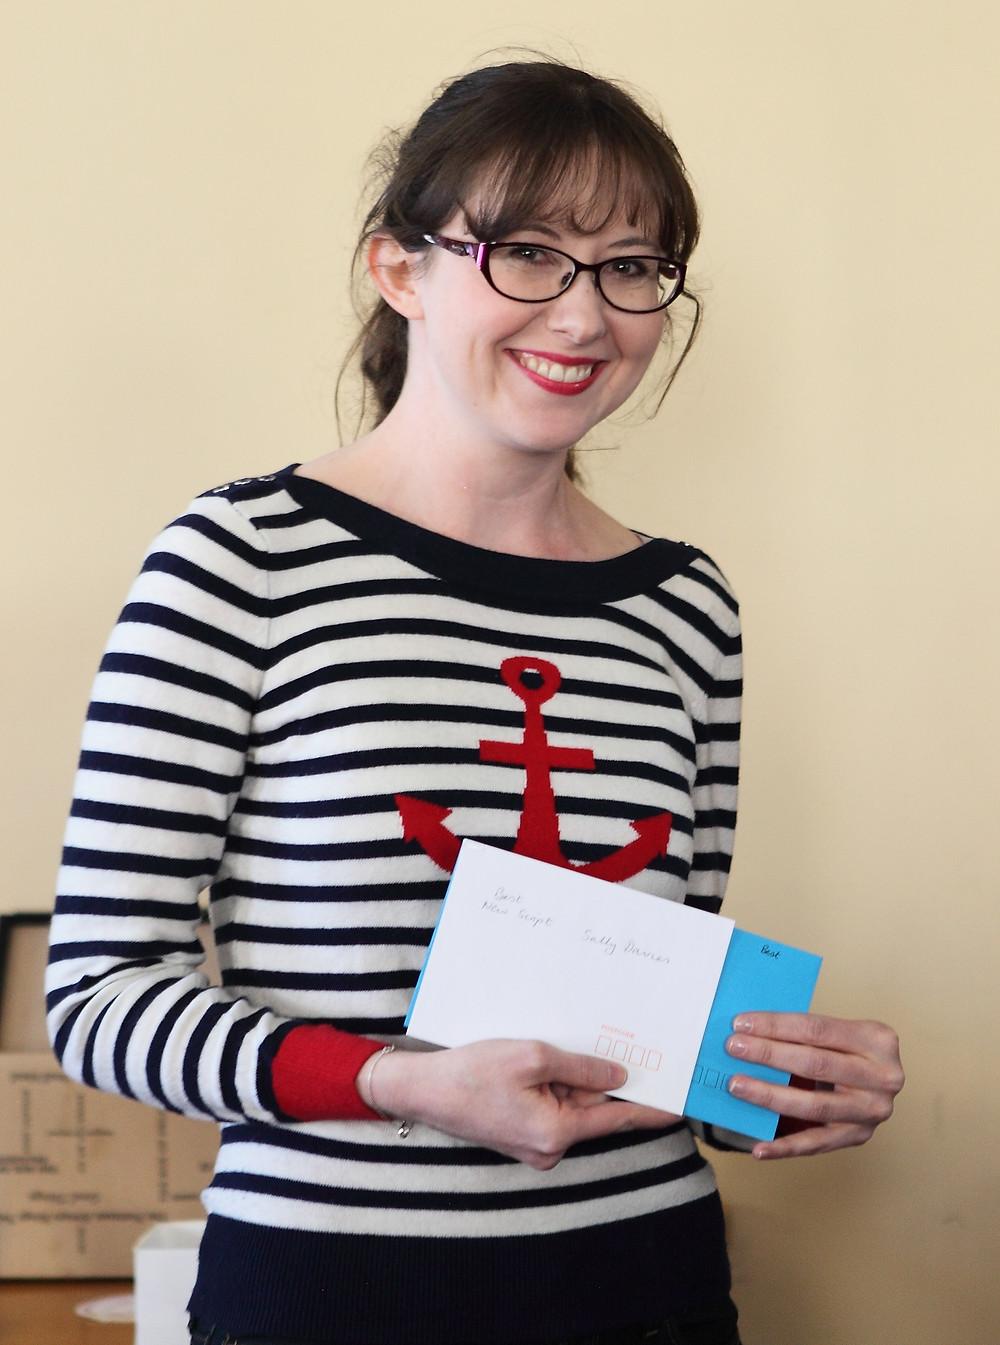 Sally Davies, winner of Best New Script